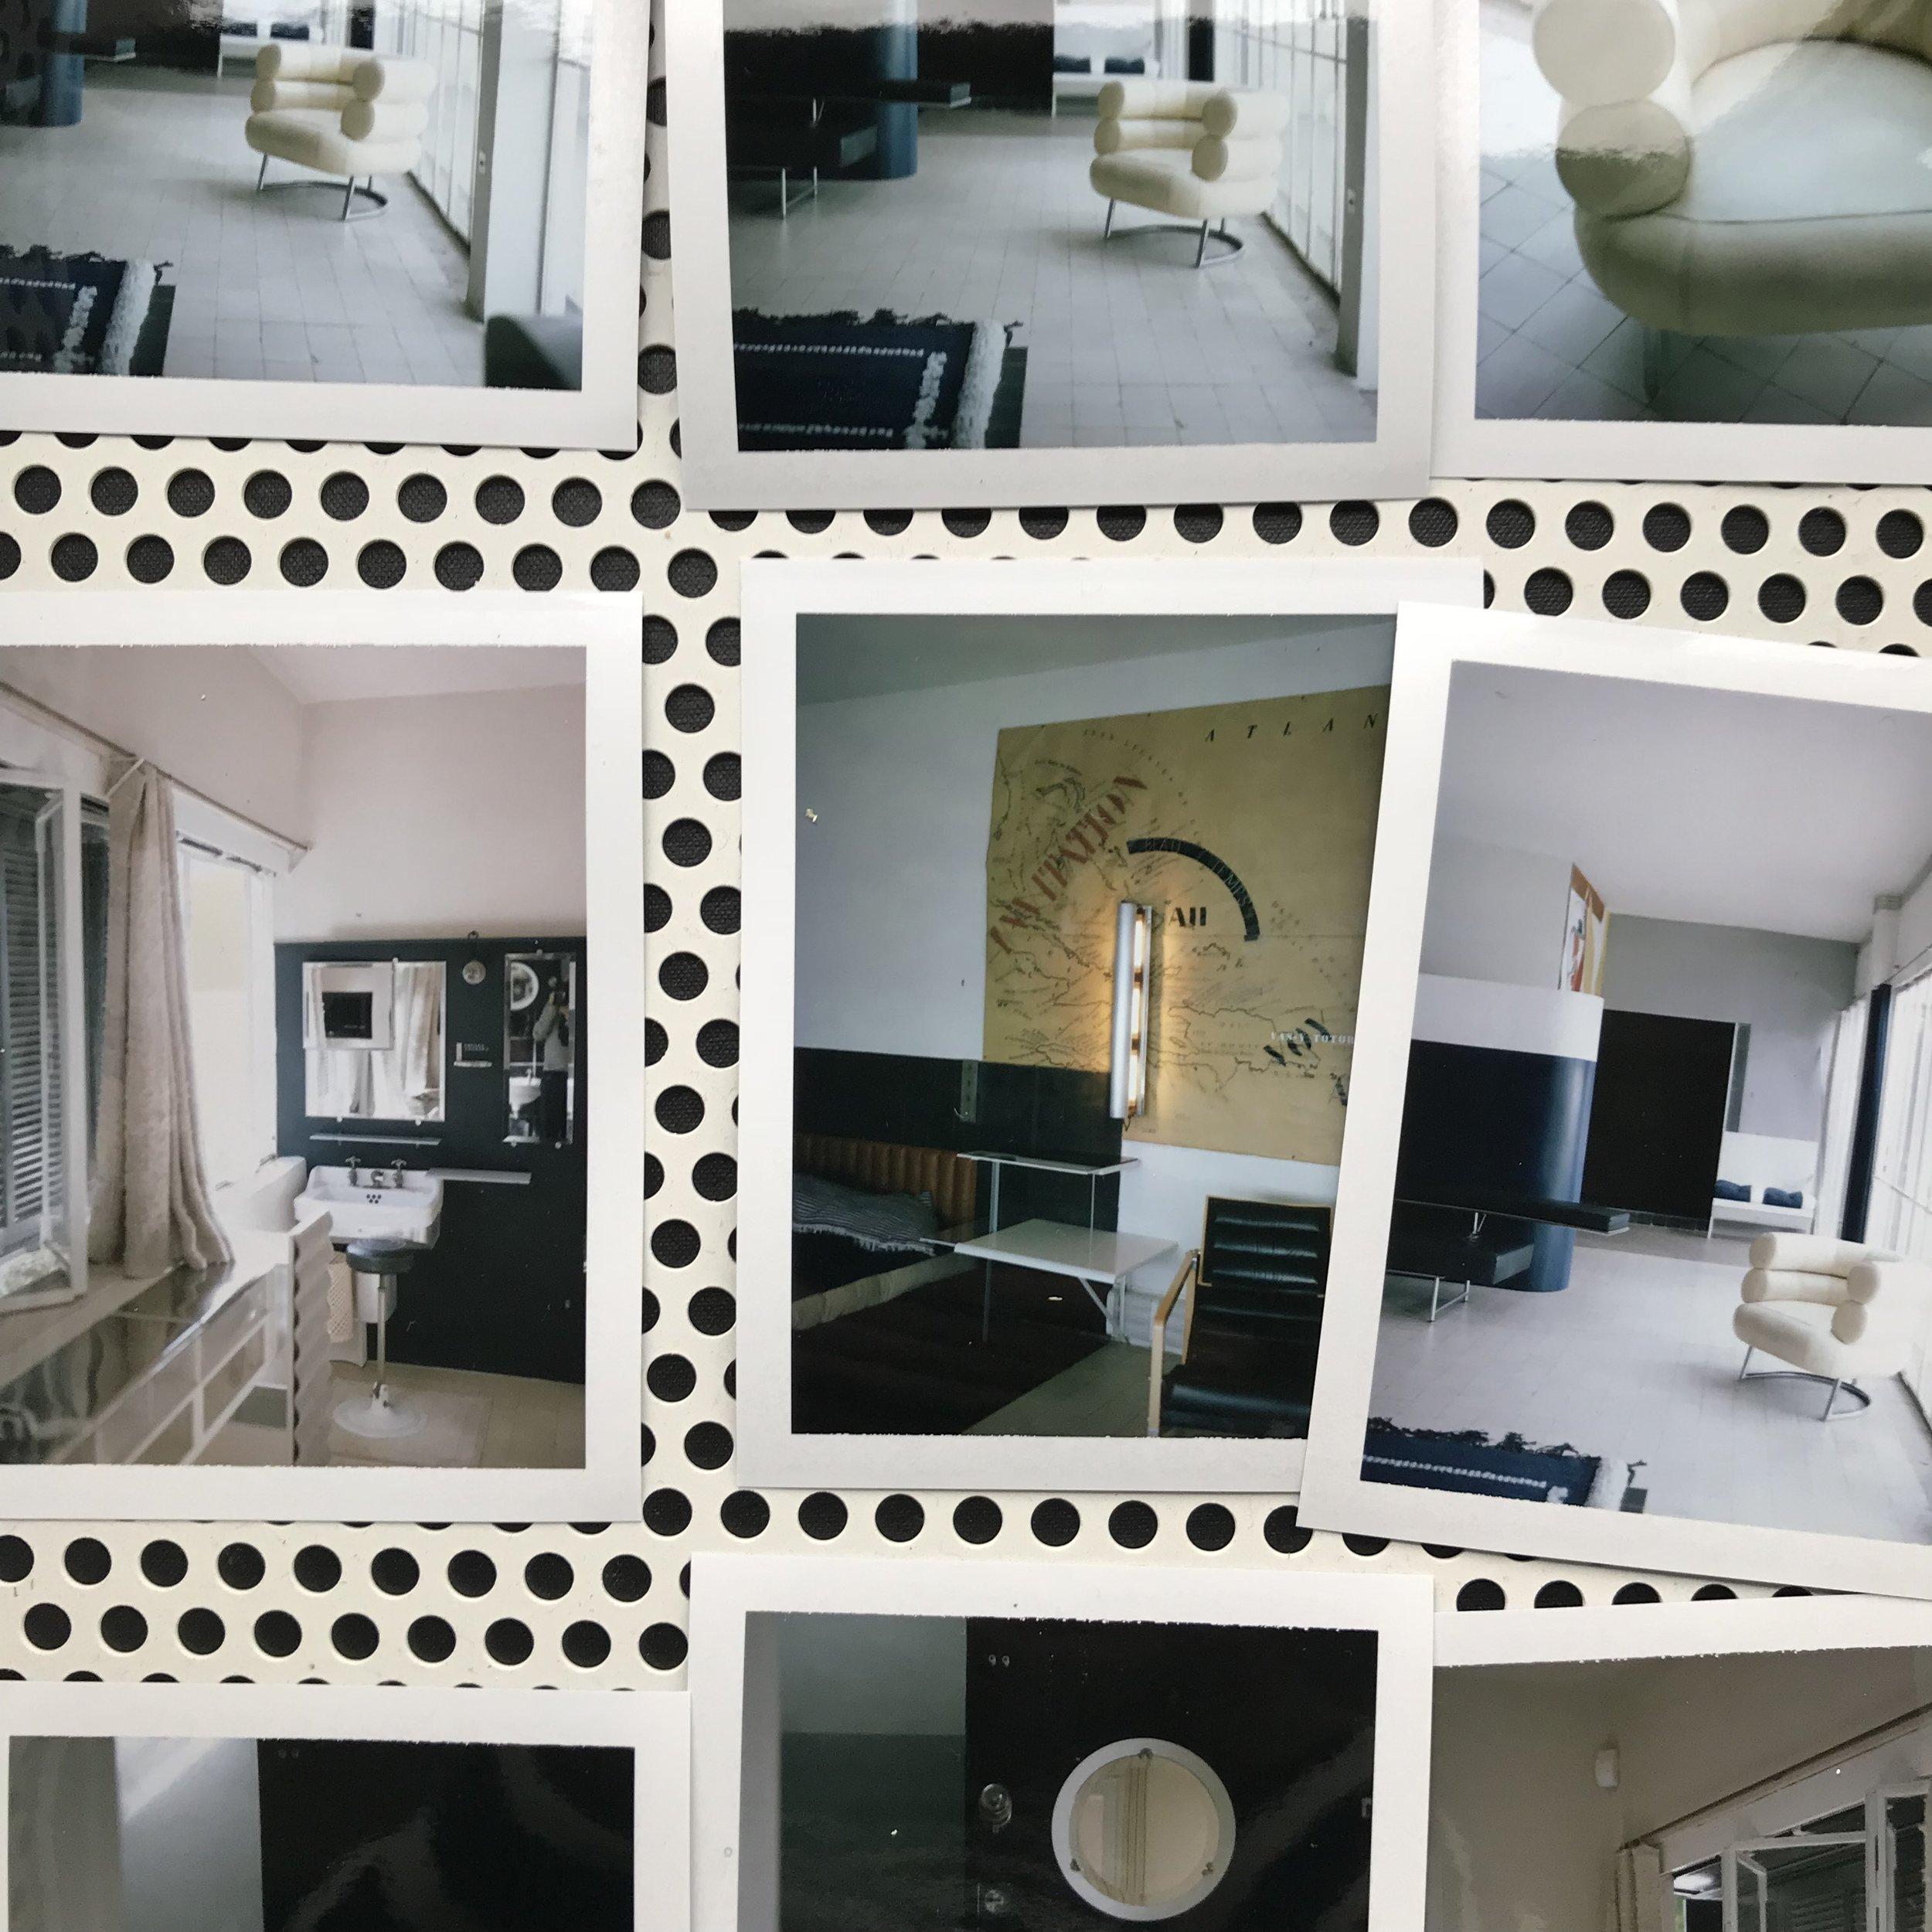 F_Halard Polaroid_E-1027_02.jpg